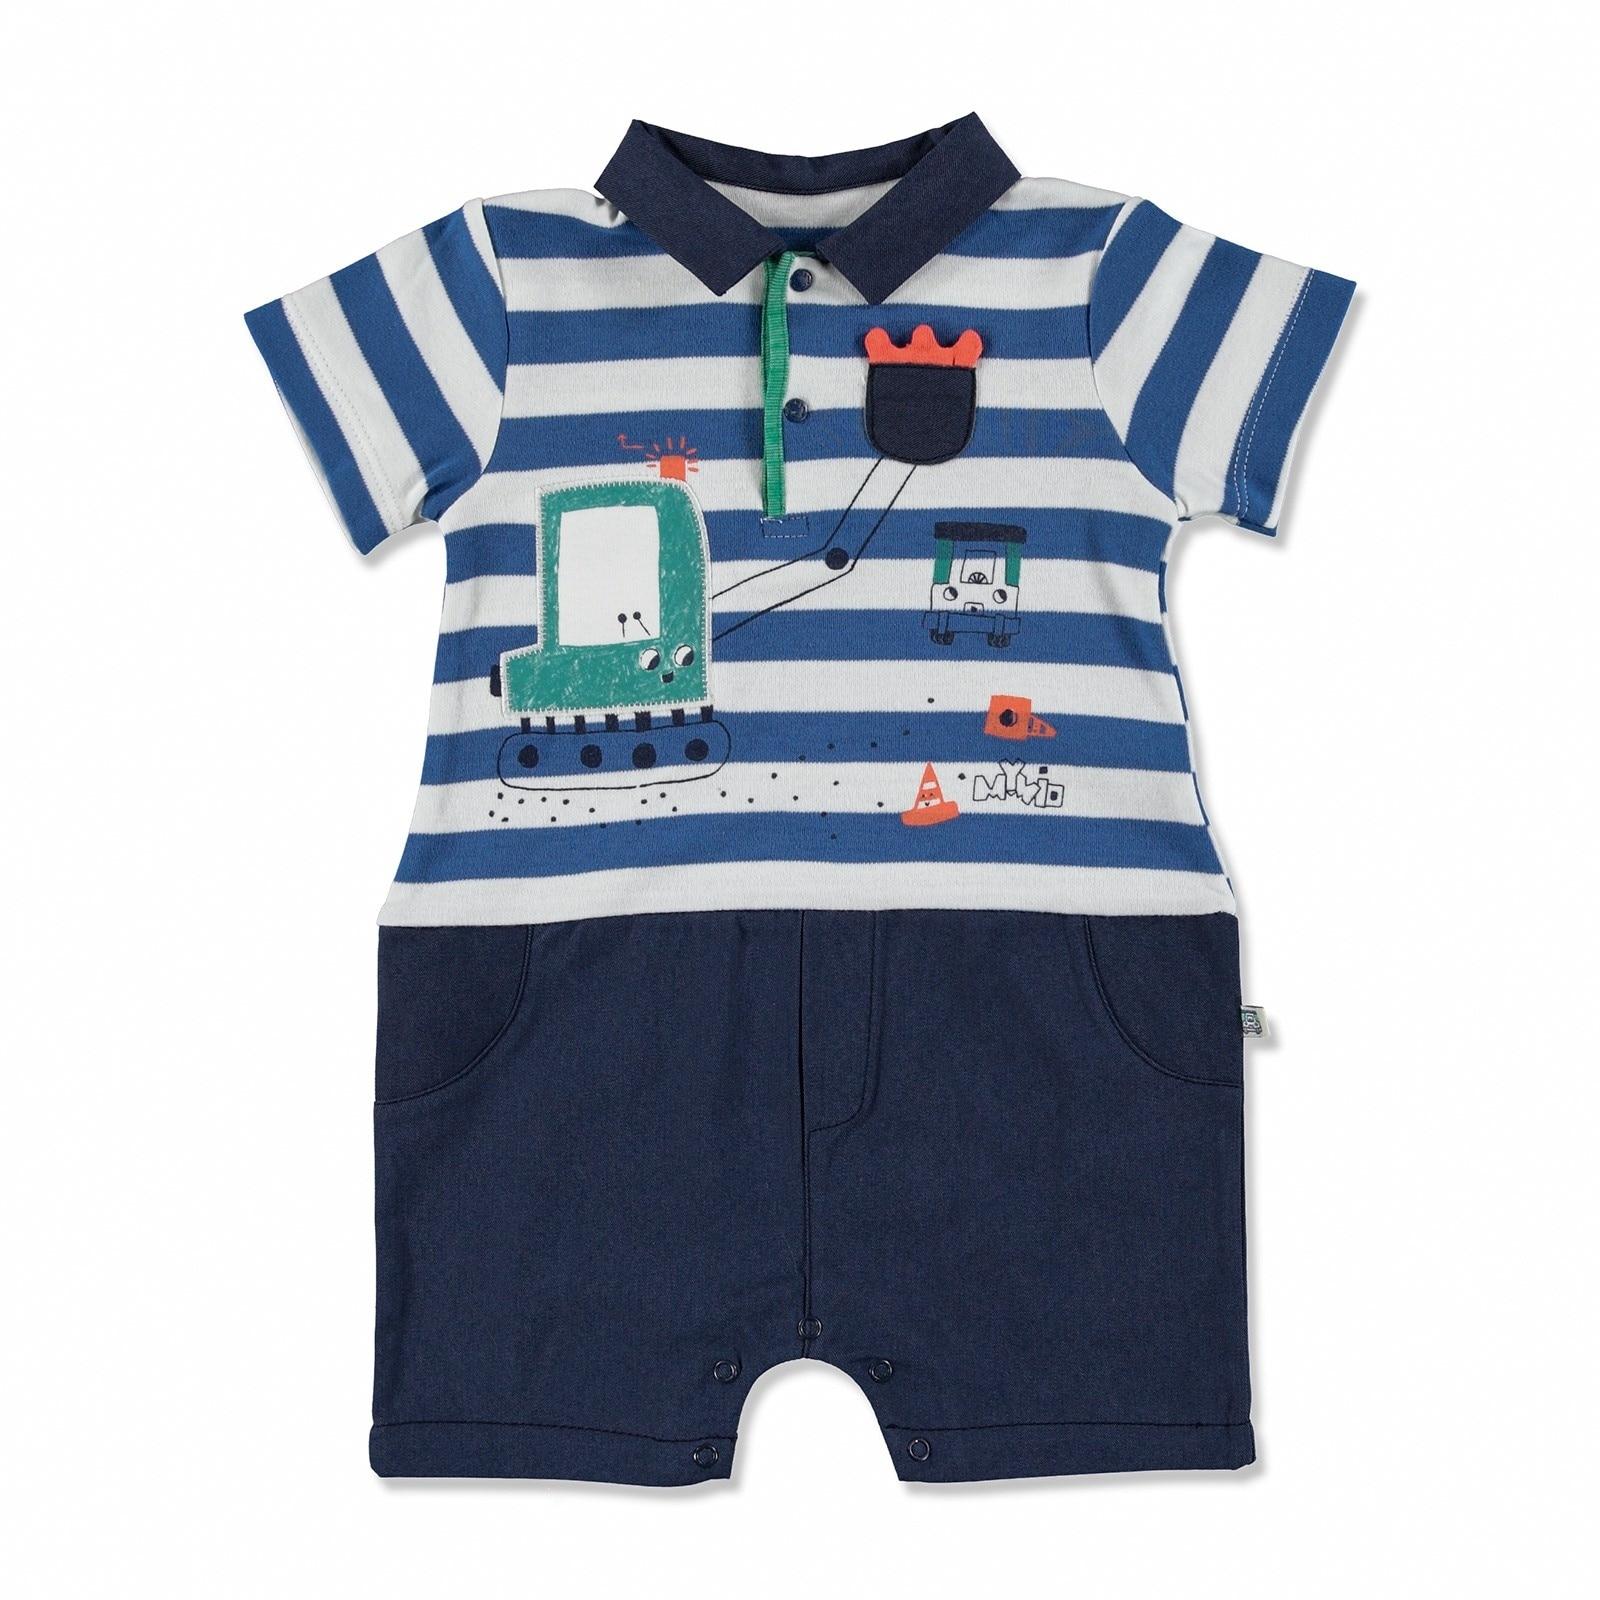 Ebebek Mymio Summer Baby Boy Scoop Interlock Short Sleeve Footless Jumpsuit